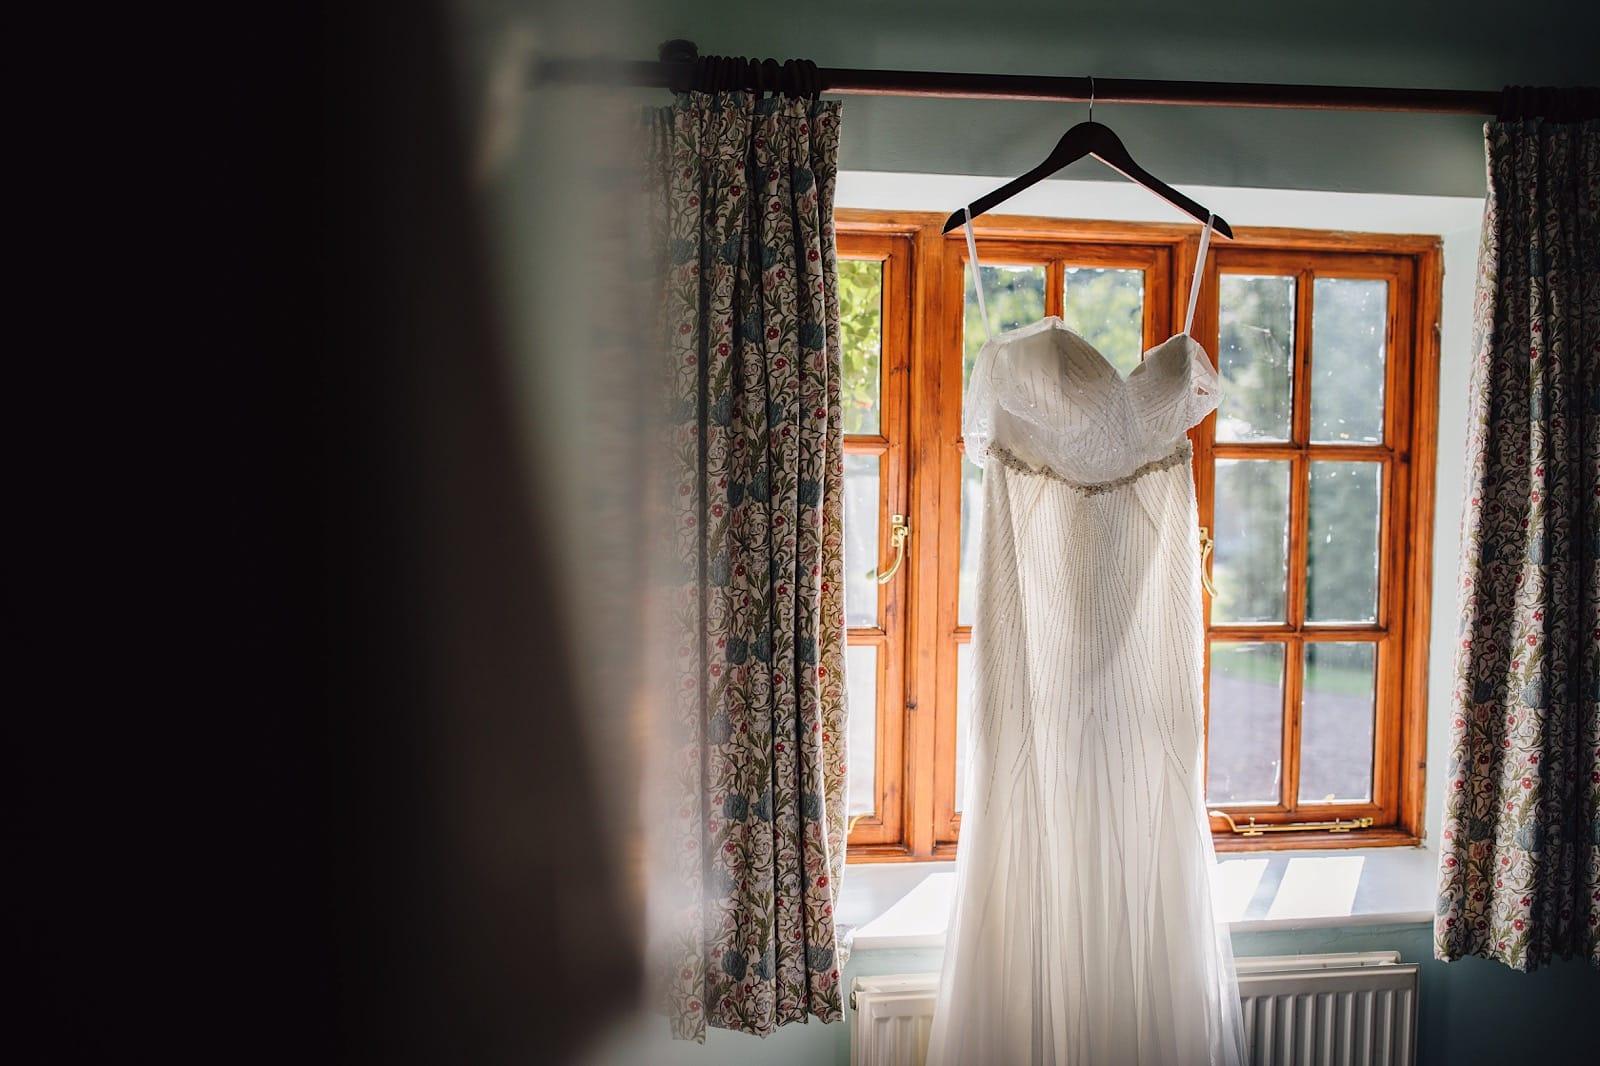 birtsmorton court wedding photography 0004